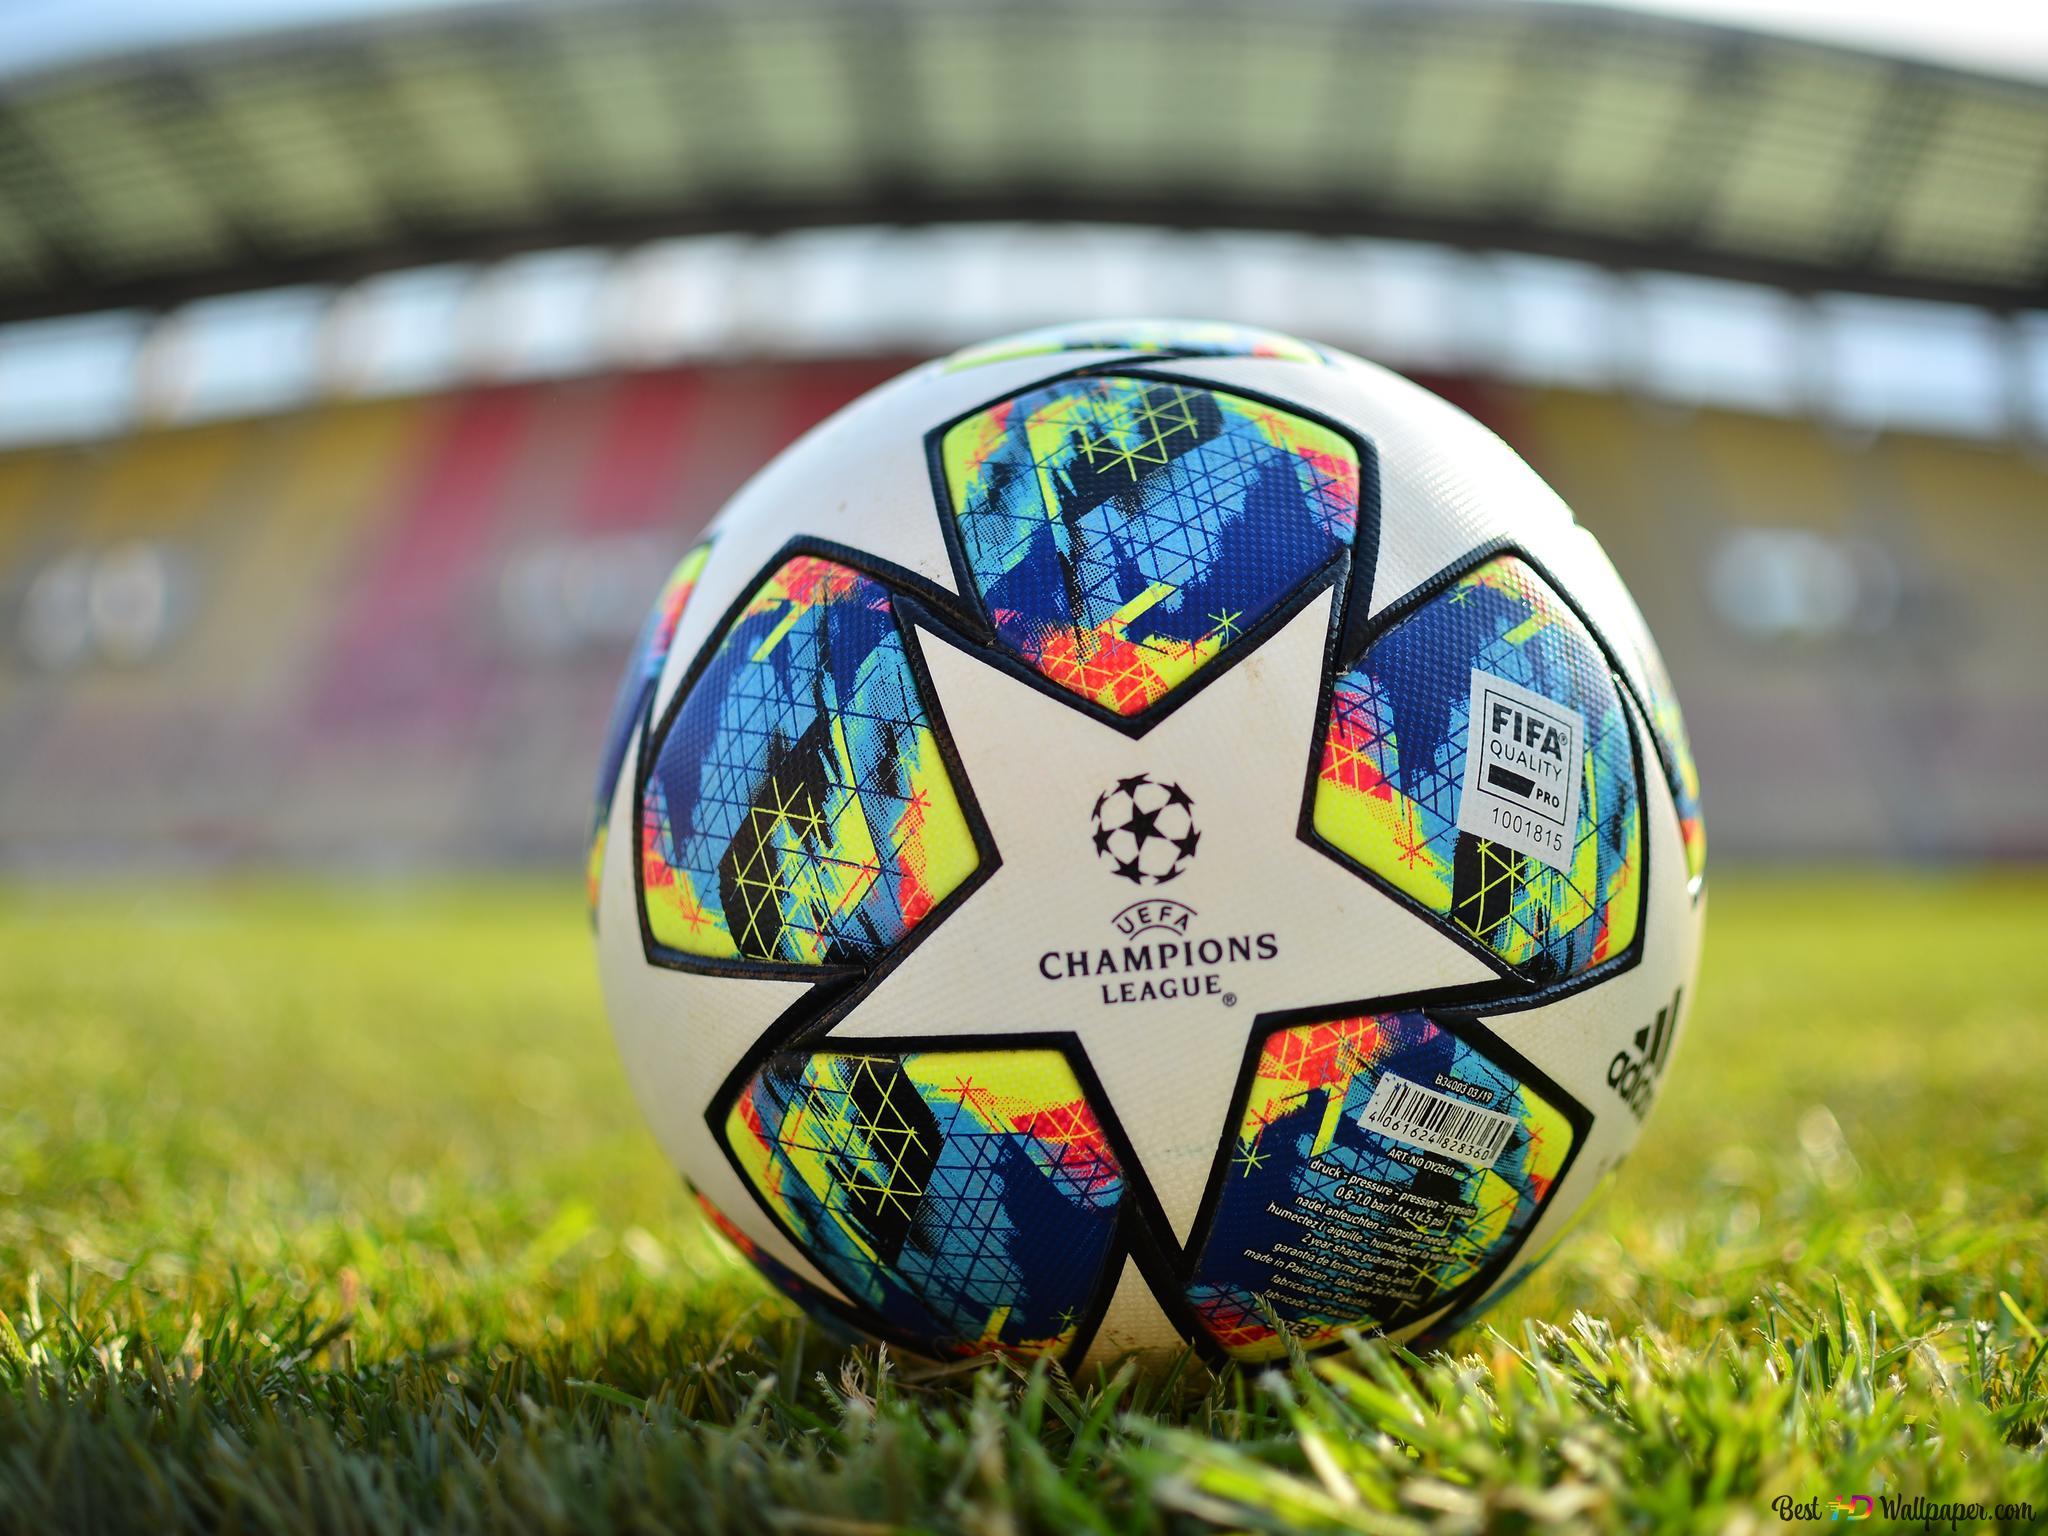 Uefa Champions League 2019 2020 Official Ball Hd Wallpaper Download